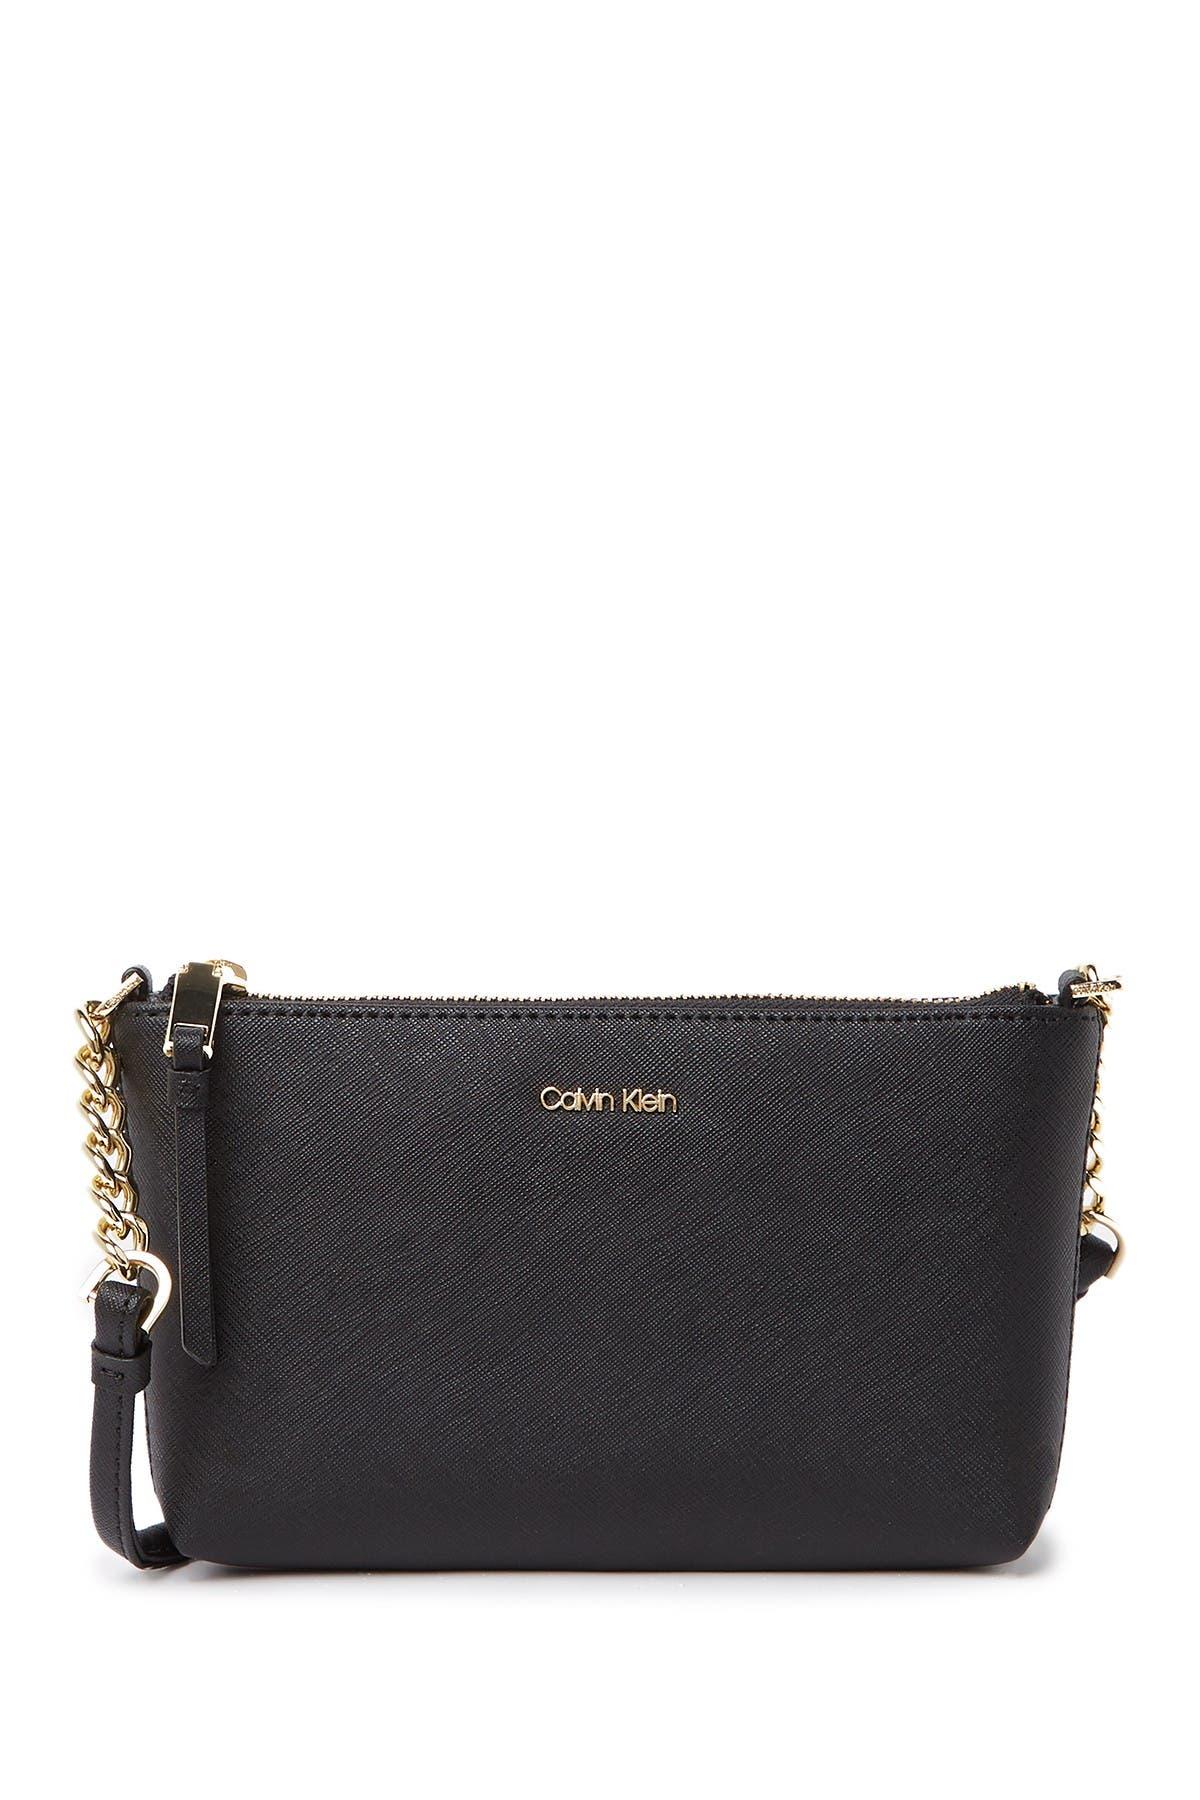 Image of Calvin Klein Hayden Saffiano Leather Key Item Crossbody Bag